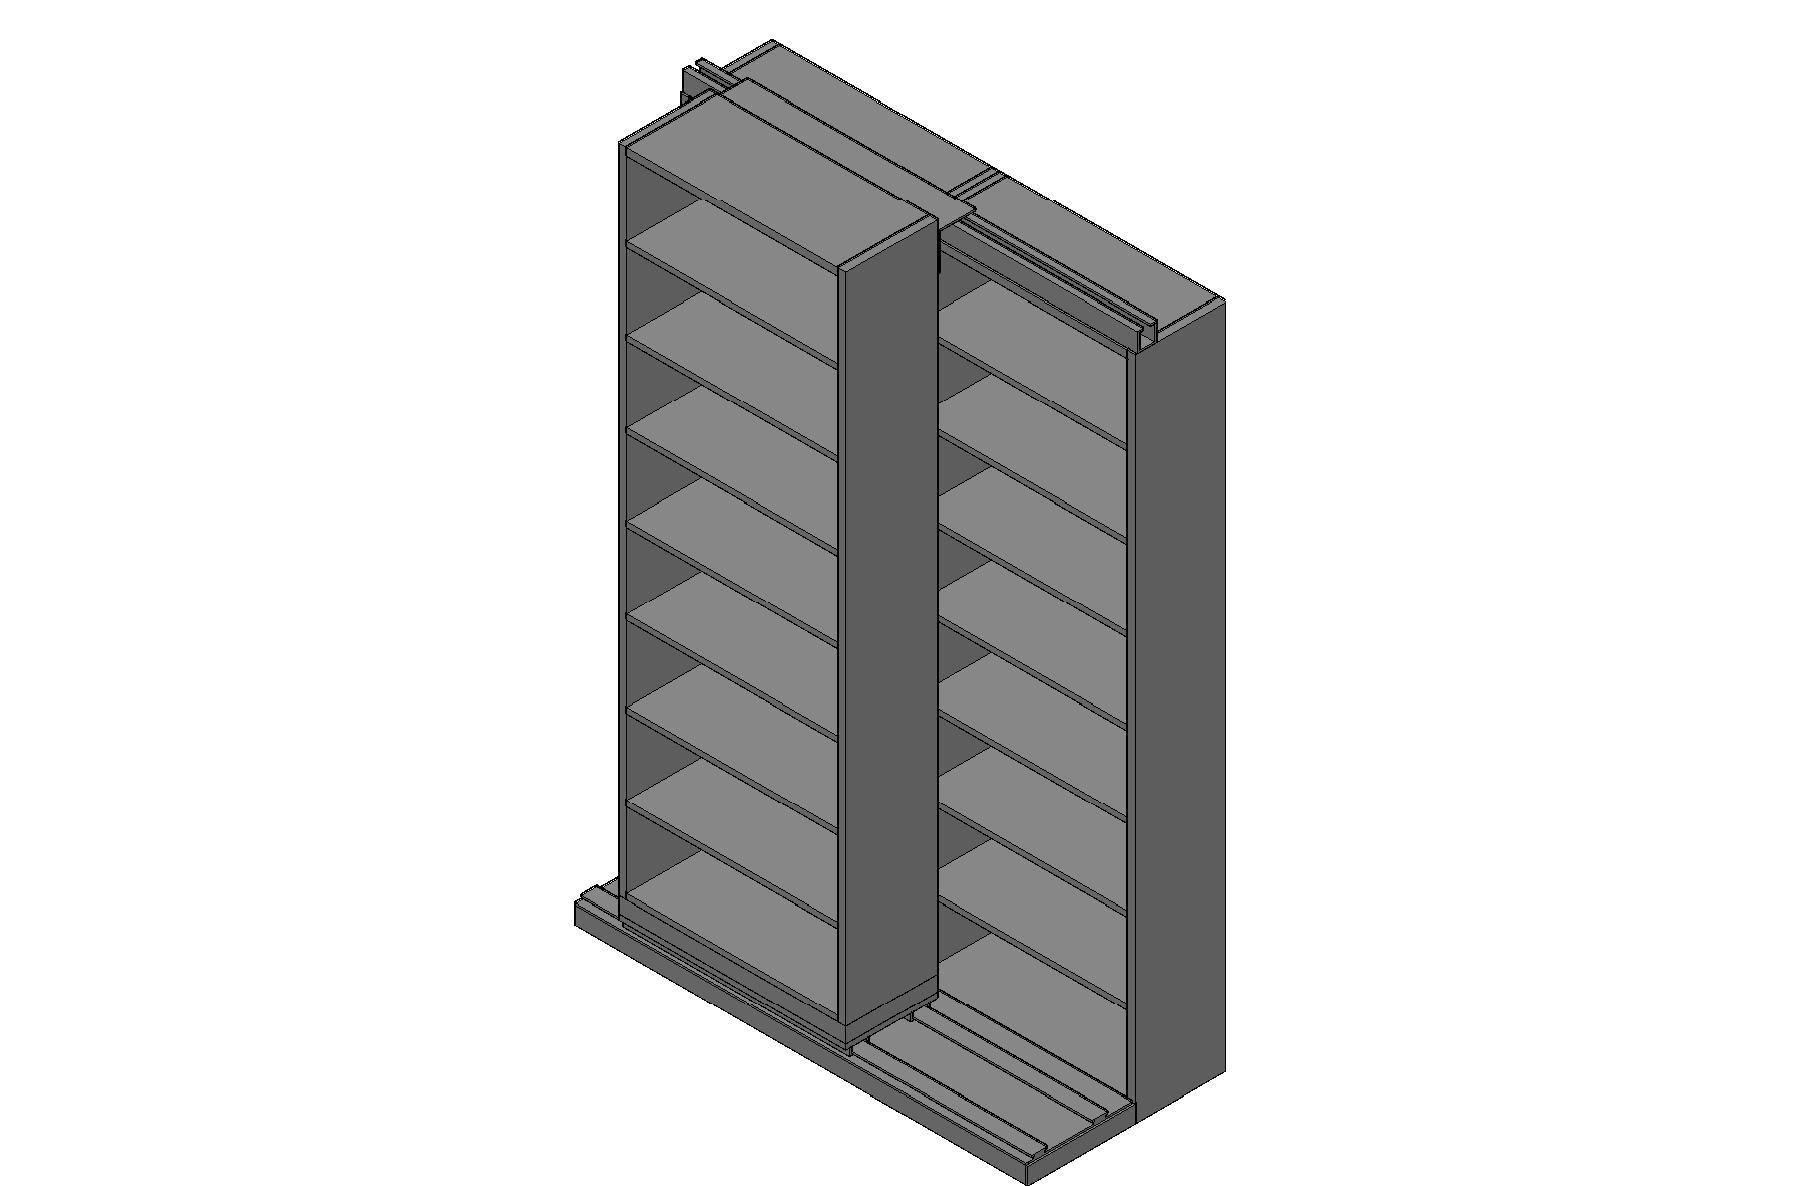 "Letter Size Sliding Shelves - 2 Rows Deep - 8 Levels - (30"" x 12"" Shelves) - 64"" Total Width"